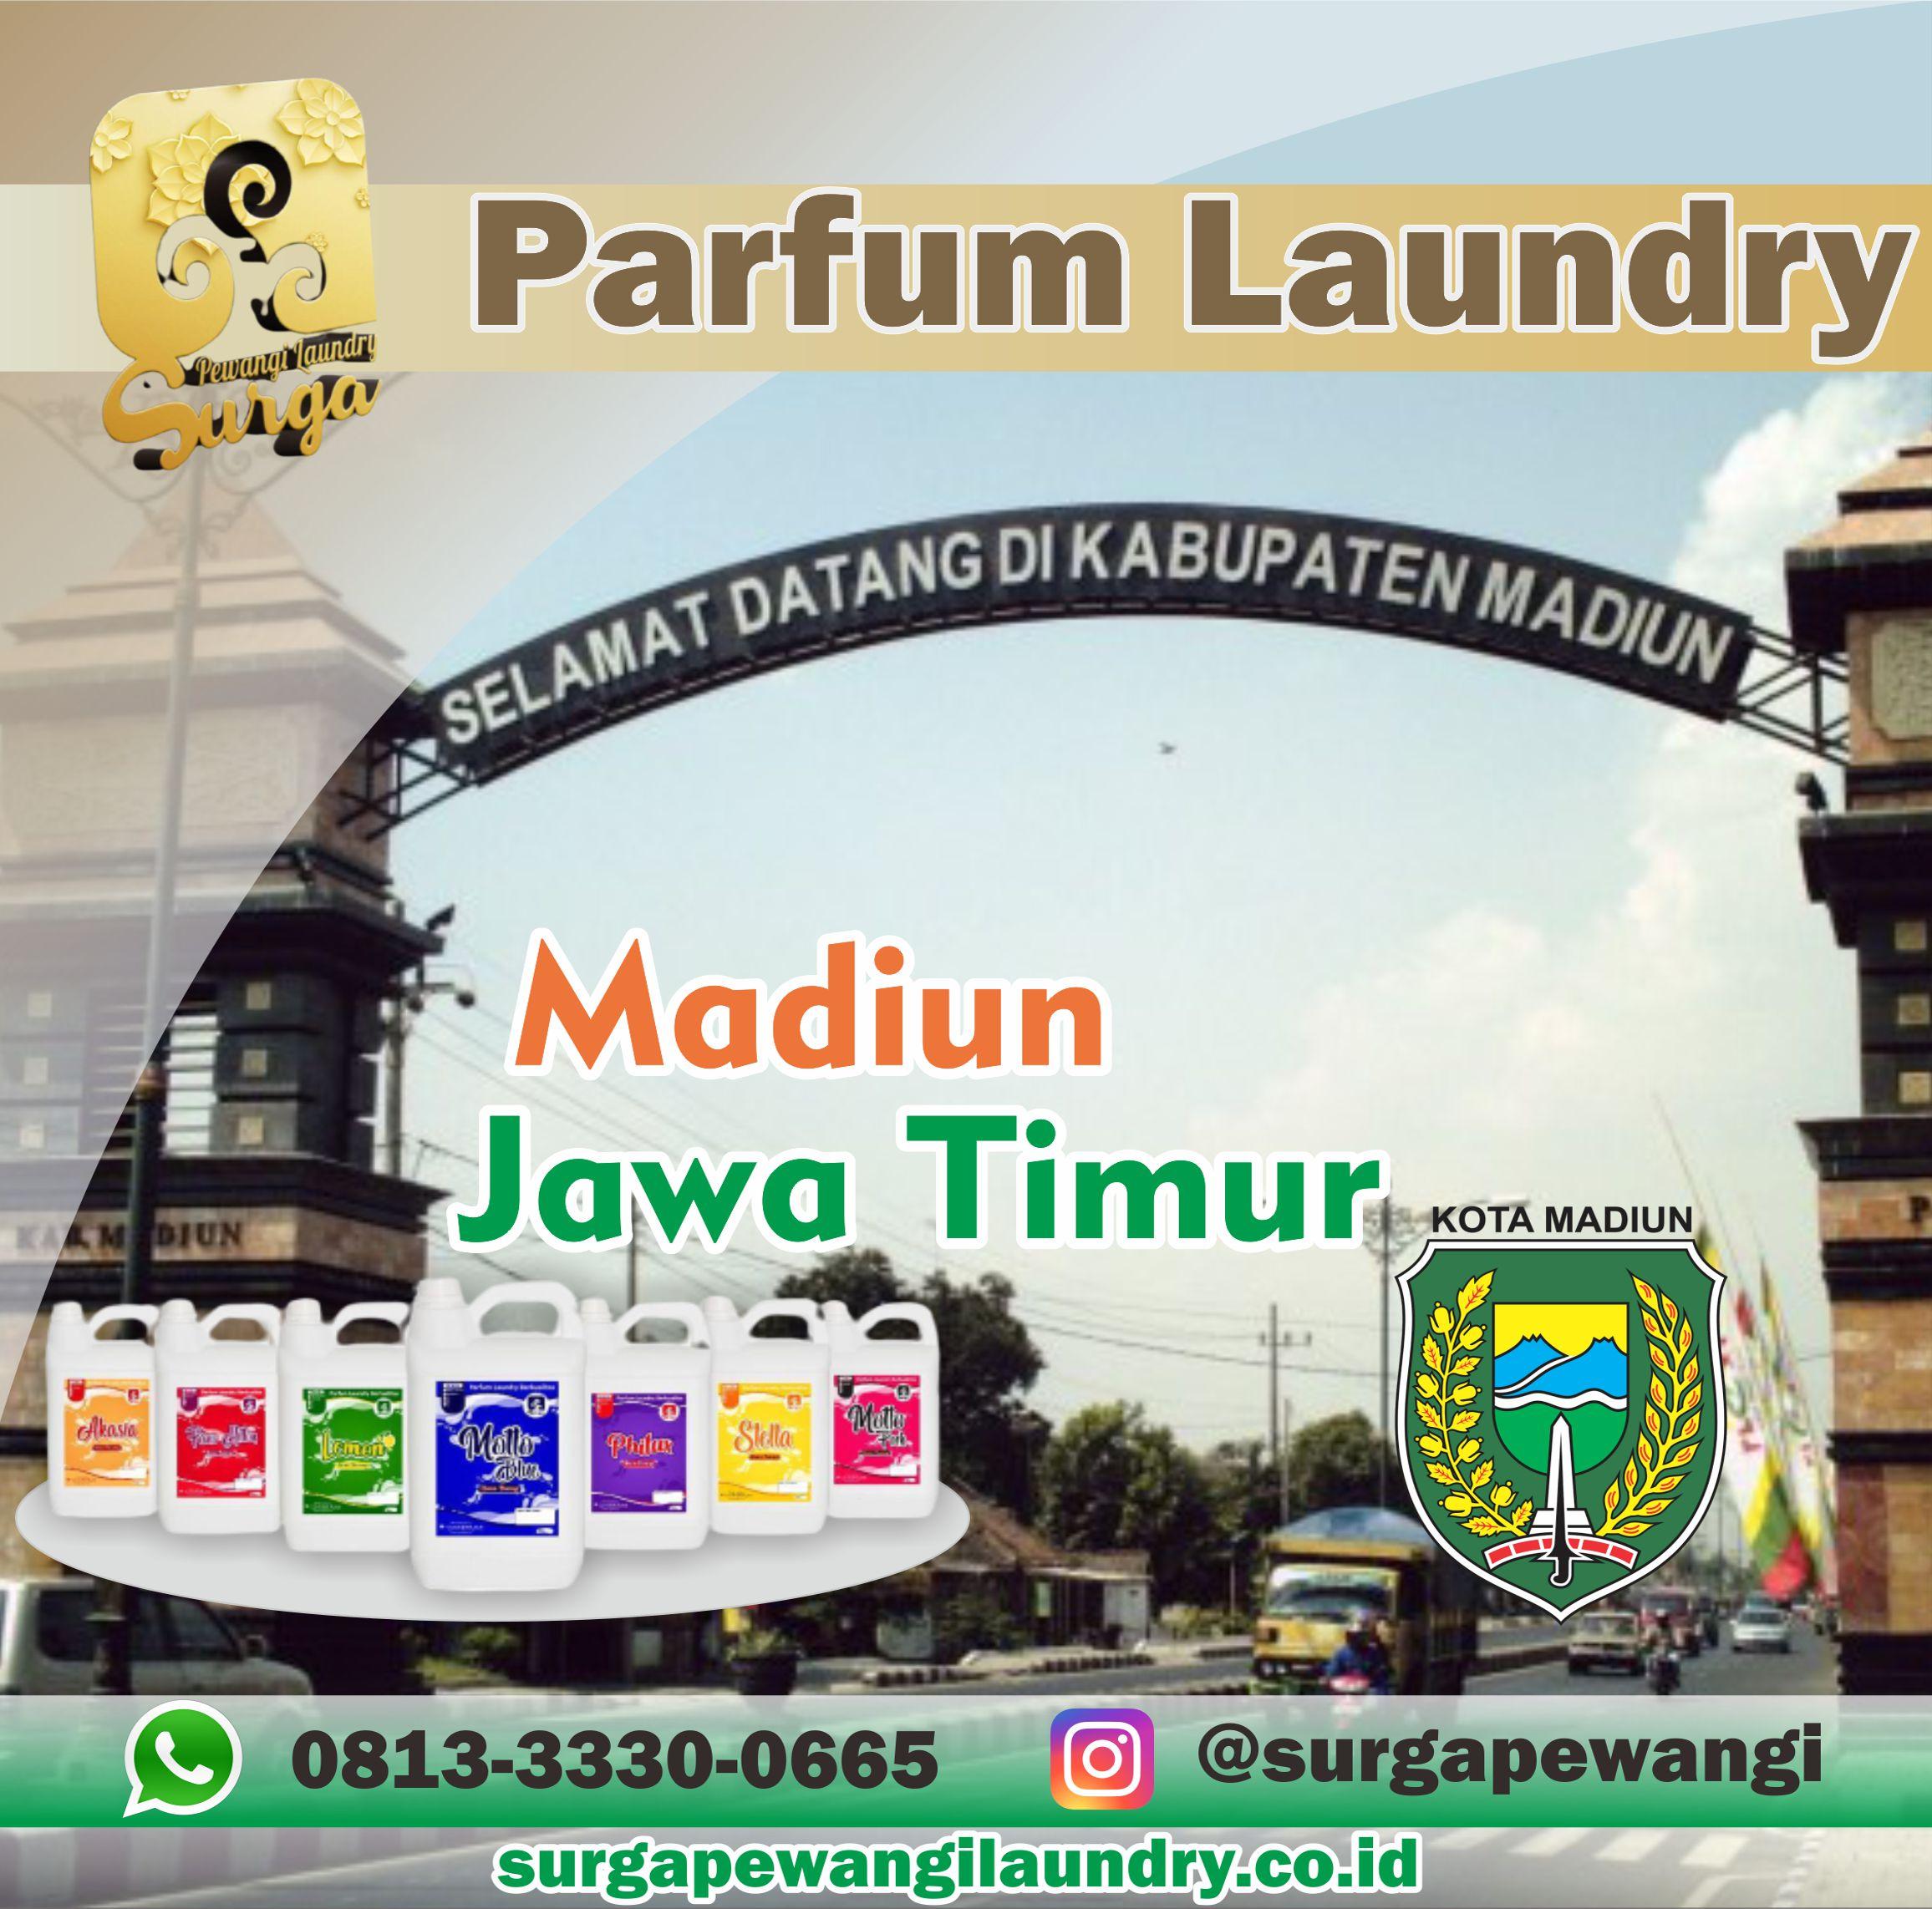 Parfum Laundry Madiun